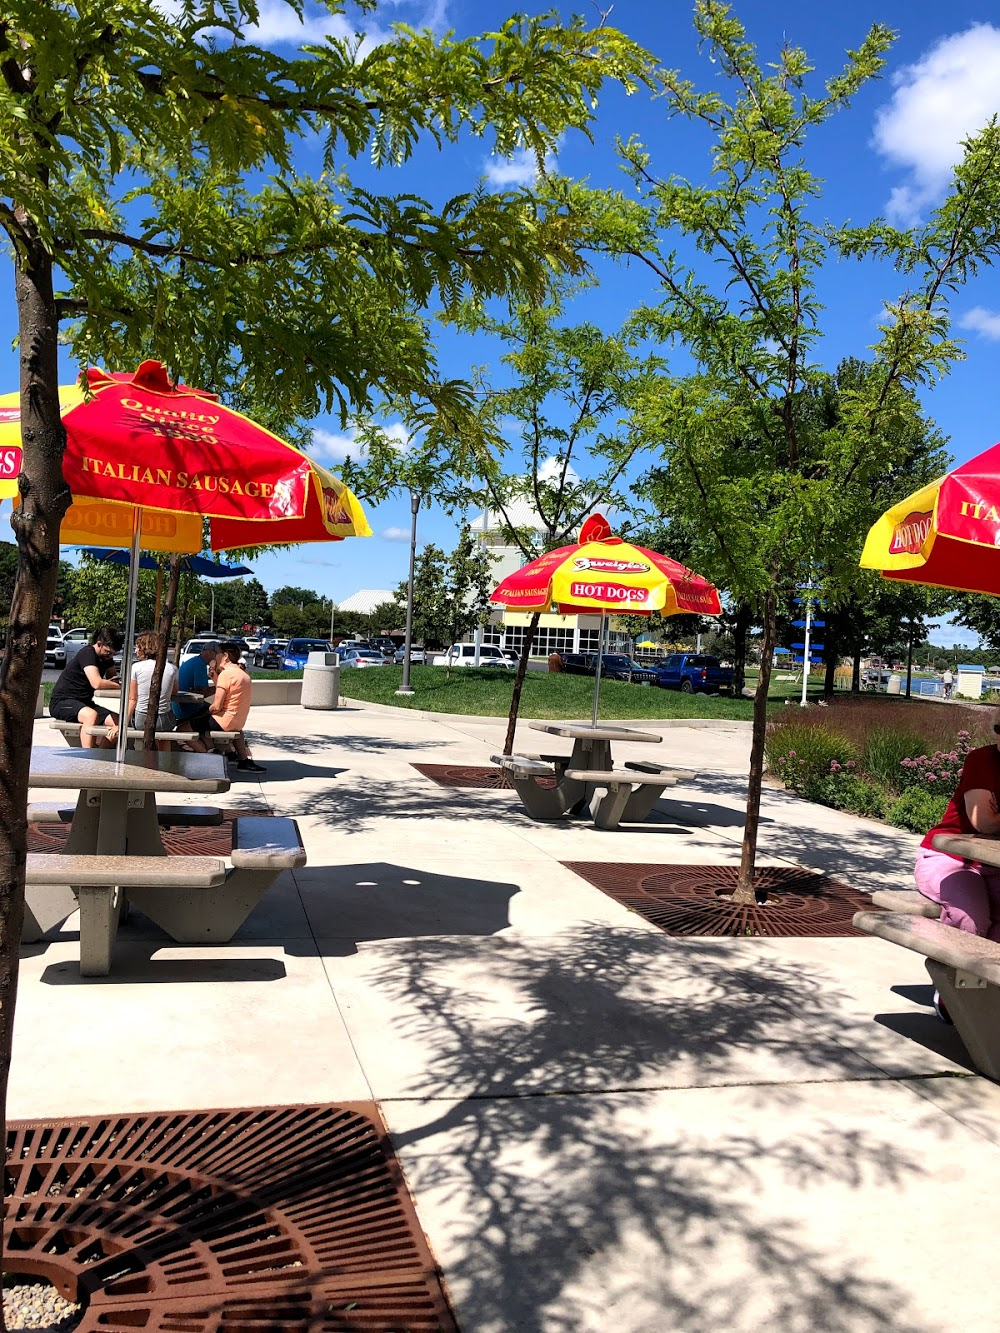 Long Pier Ice Cream & Rentals